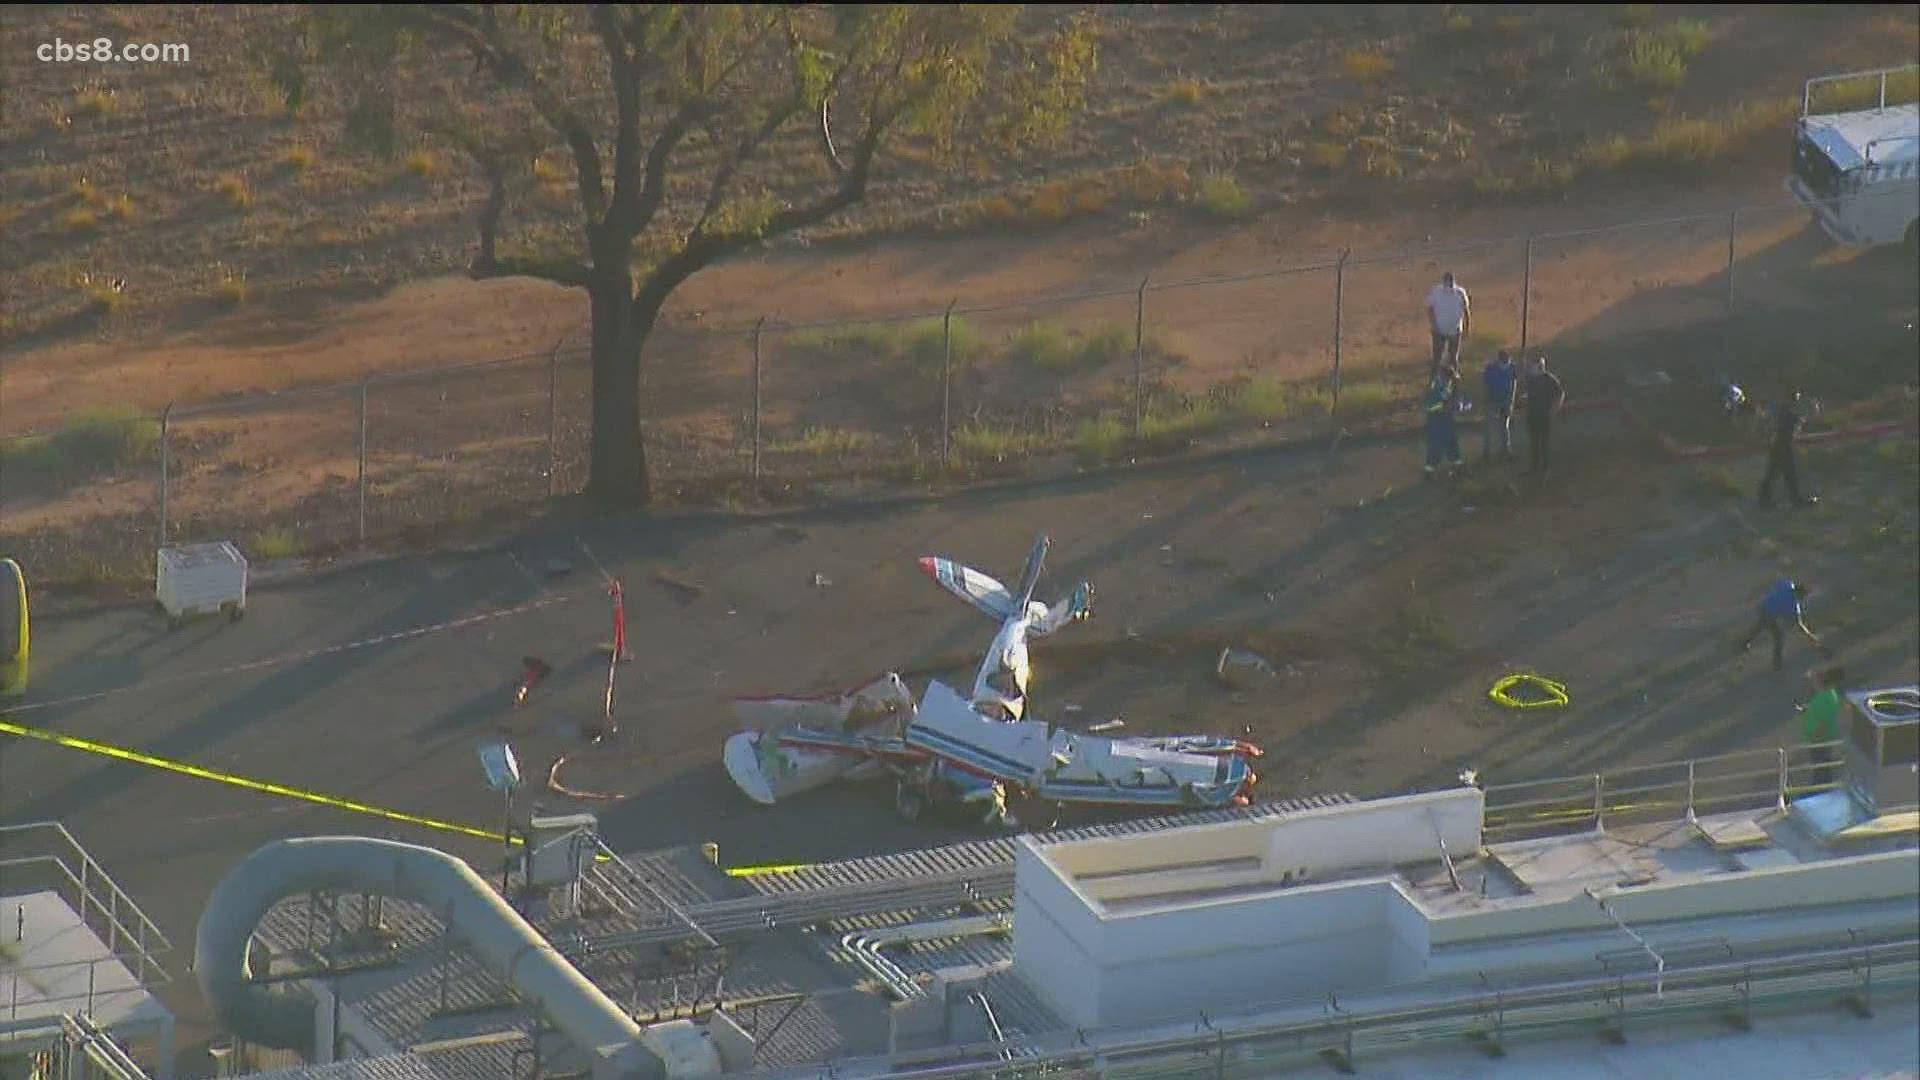 Passenger Pilot Injured In Small Plane Crash Near Montgomery Field Cbs8 Com